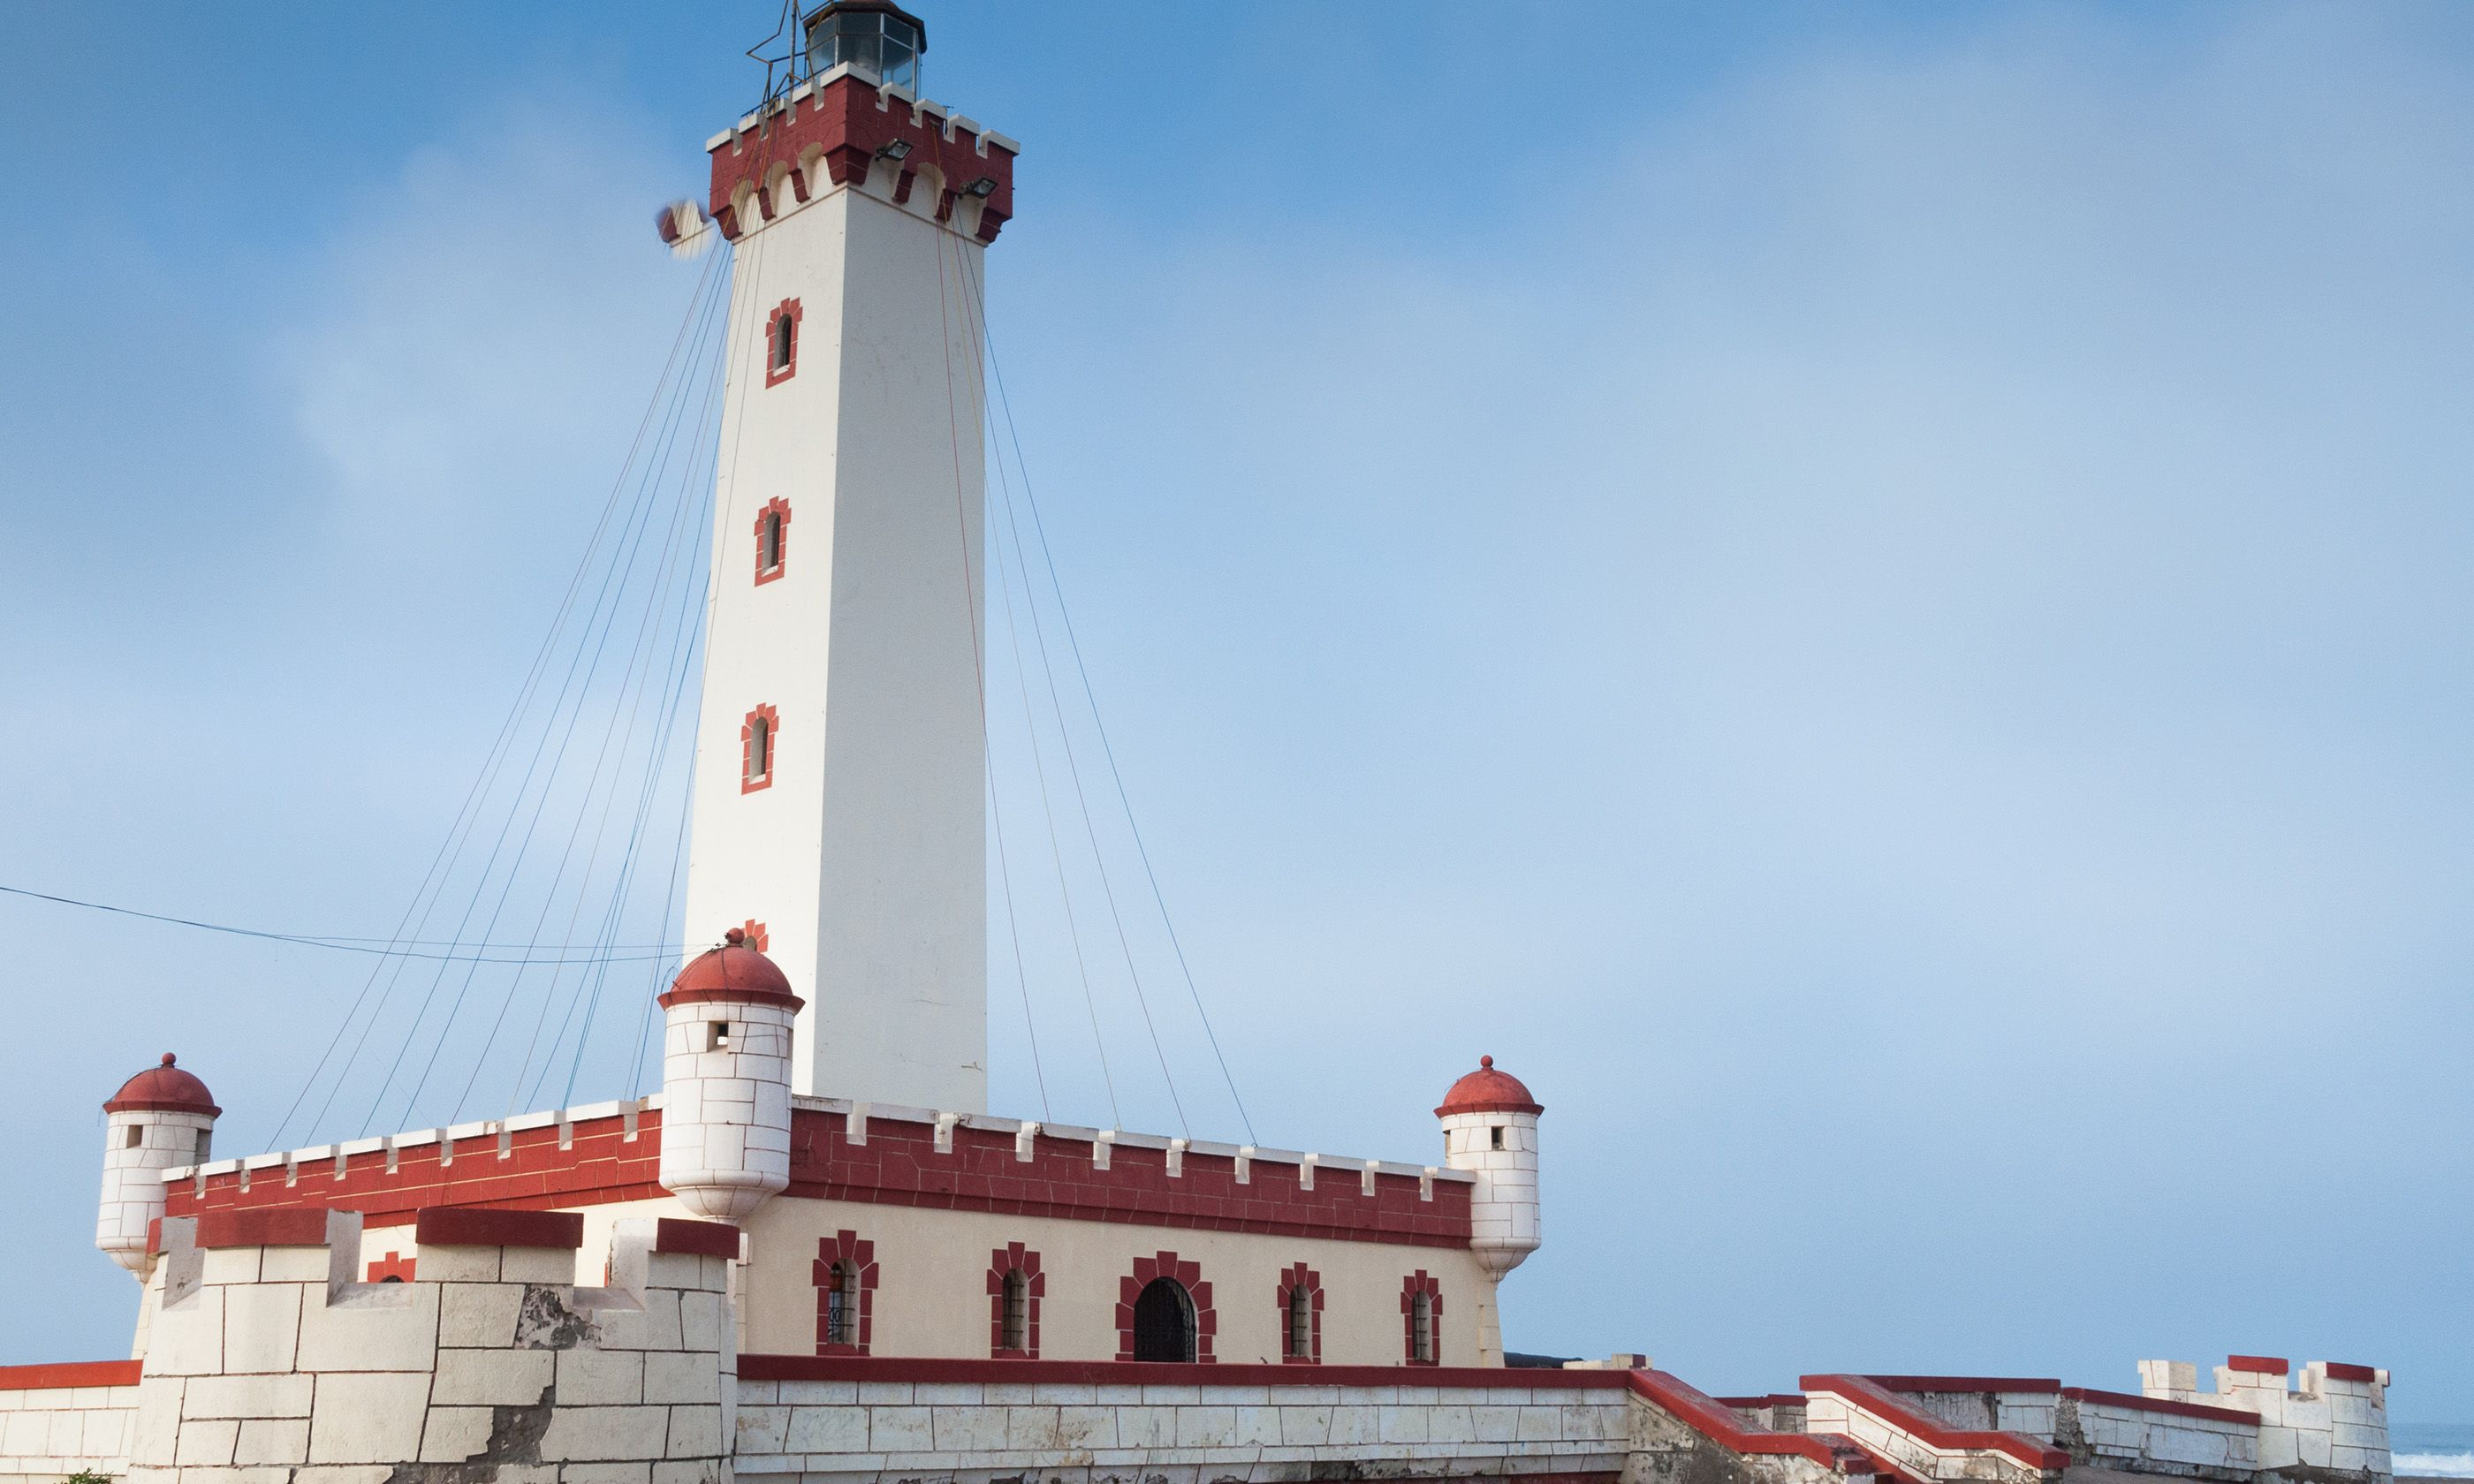 Serán lighthouse, Chile (Shutterstock.com)